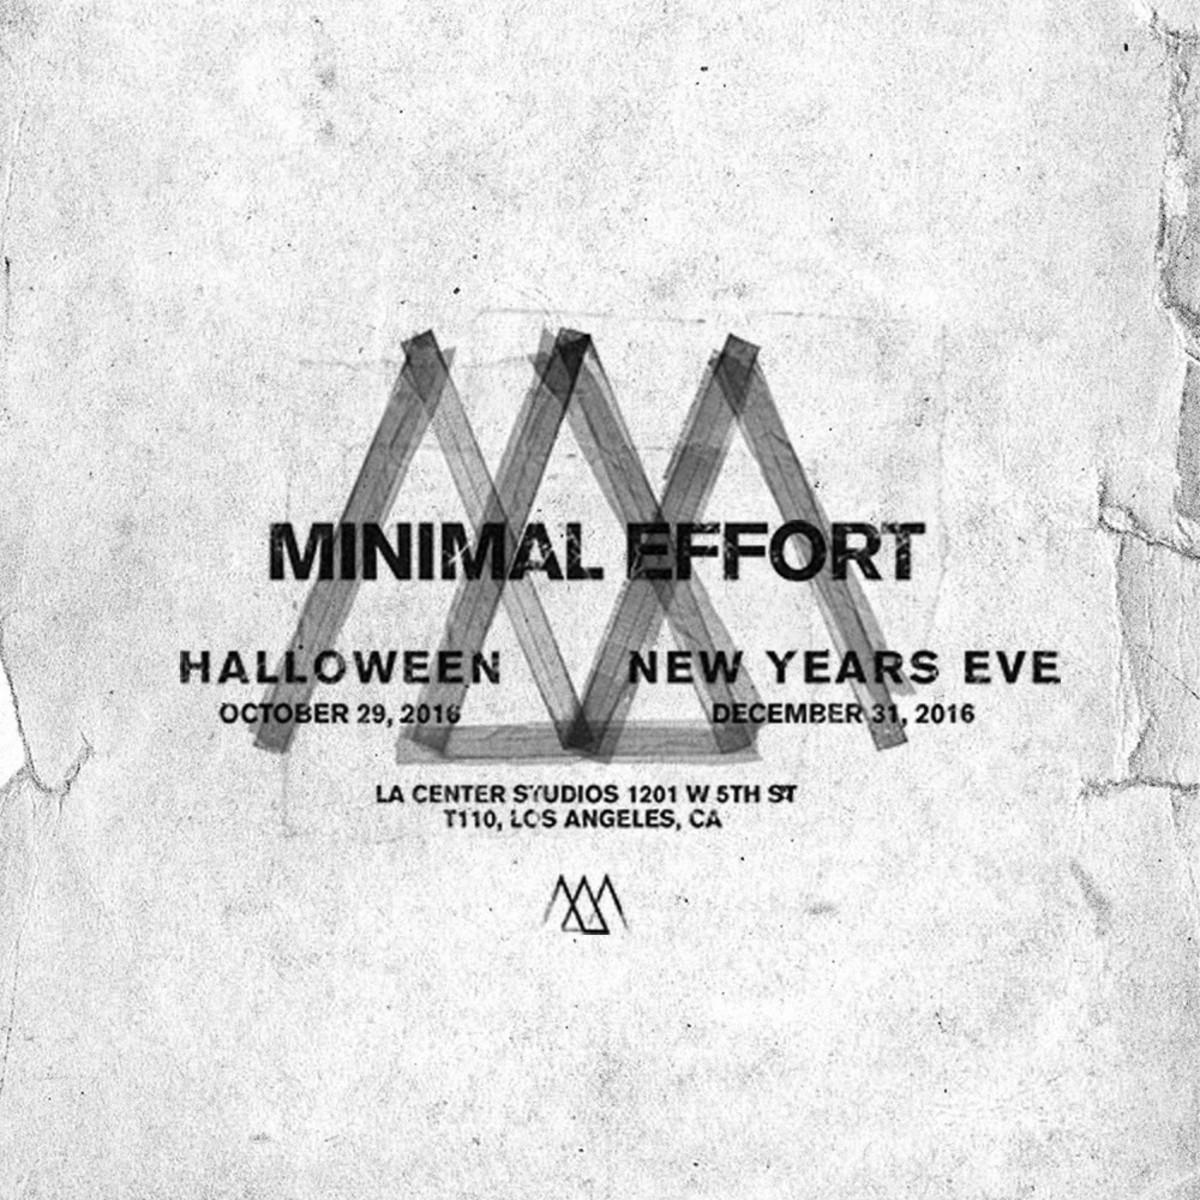 Minimal-Effort-Dual-Announce-Tile.jpg